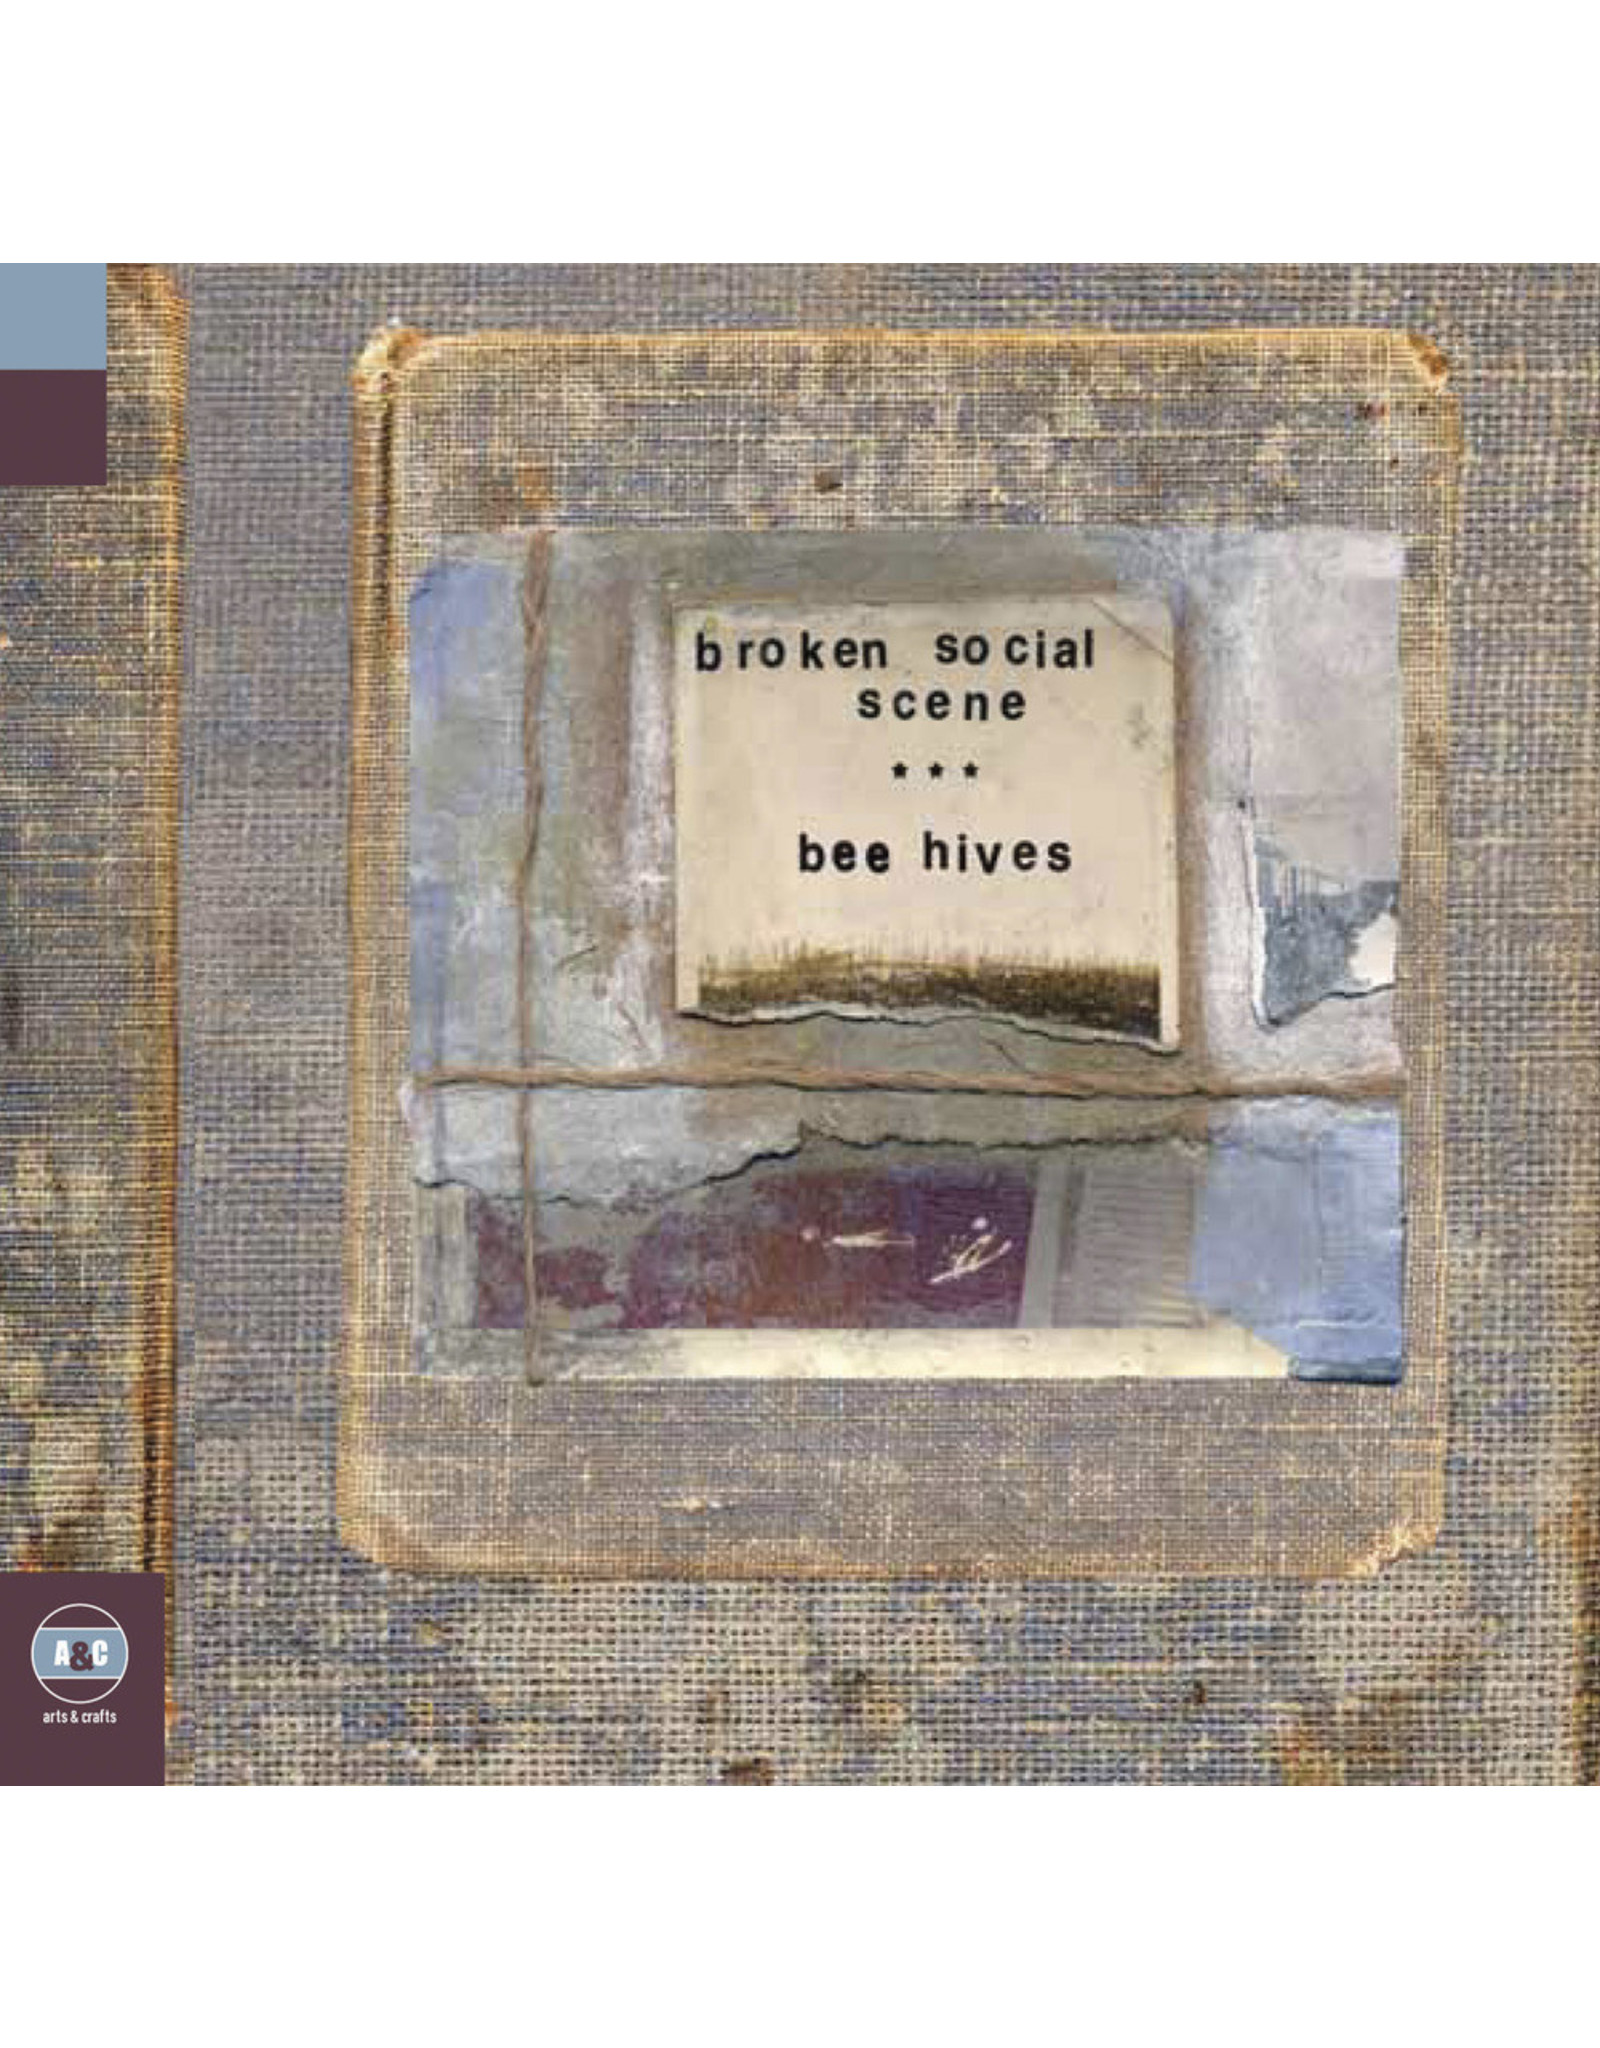 Broken Social Scene - Bee Hives